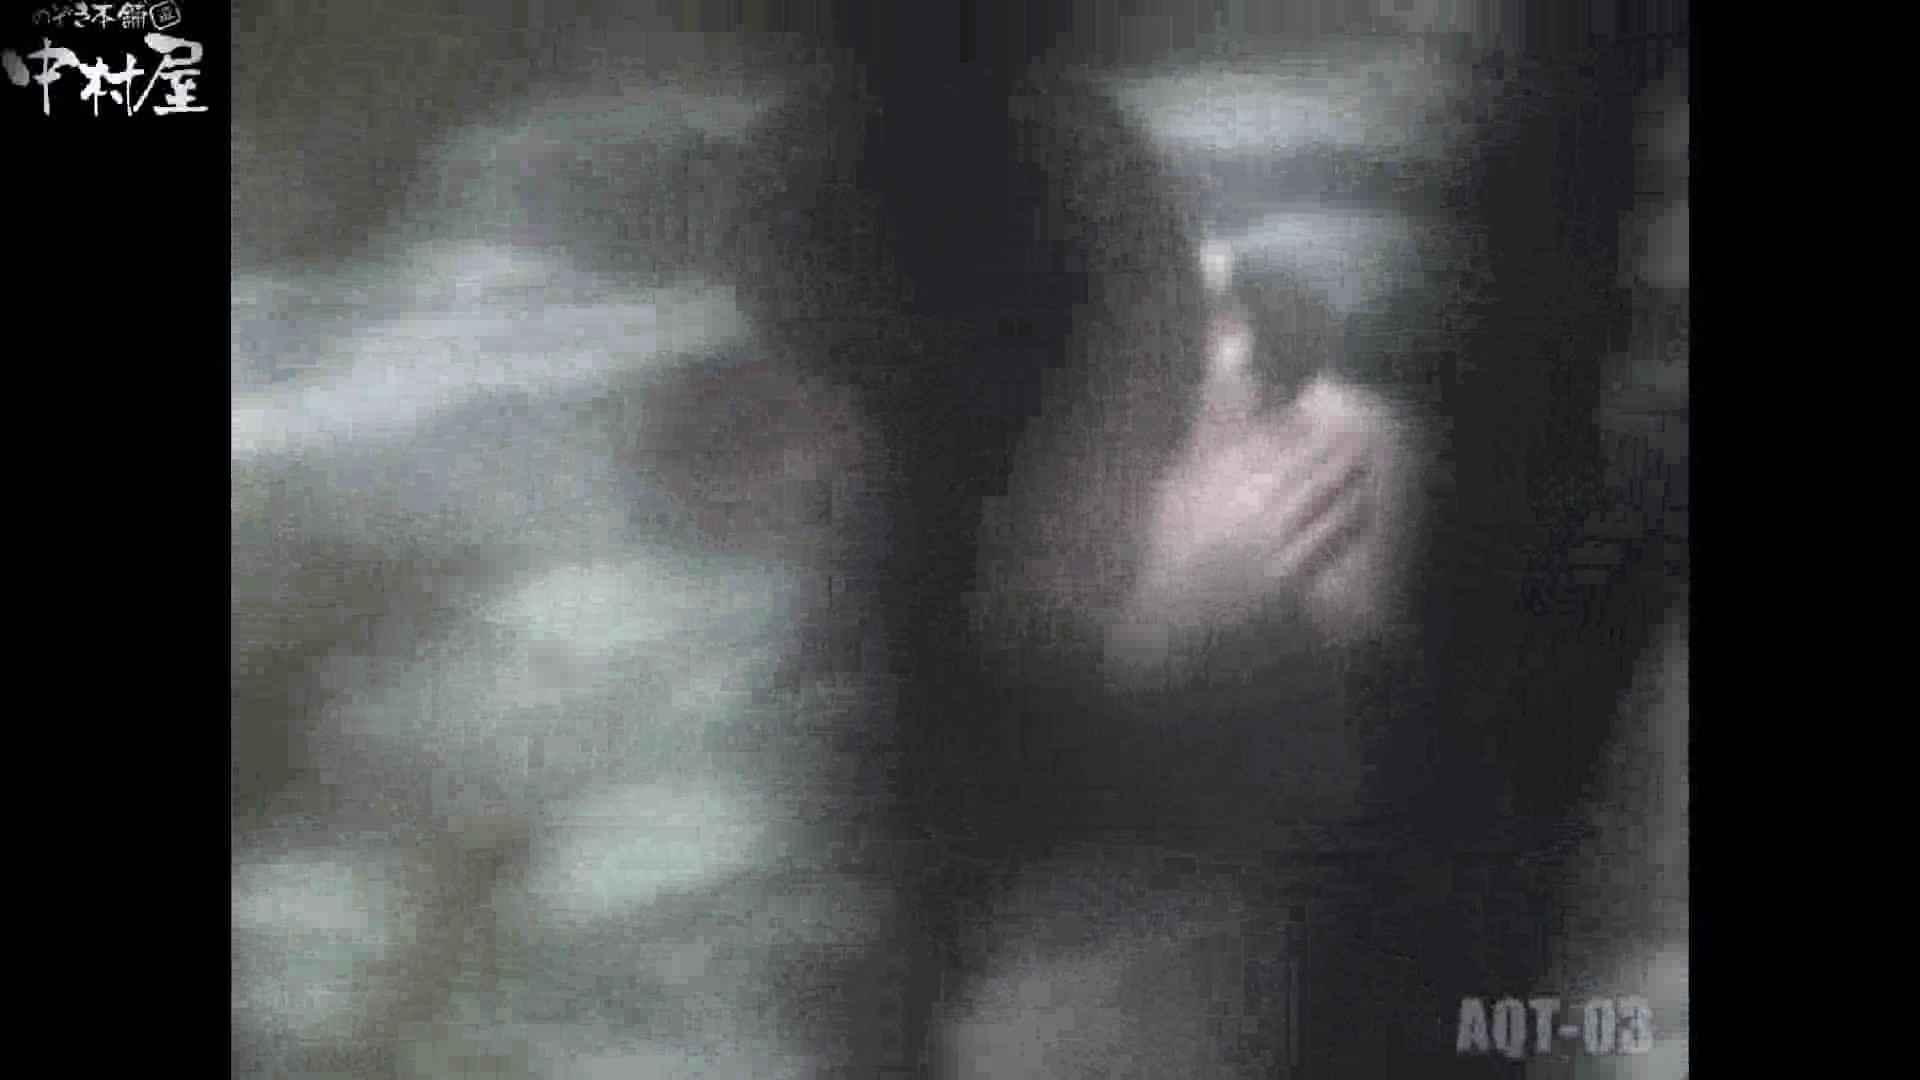 Aquaな露天風呂Vol.867潜入盗撮露天風呂参判湯 其の八 潜入シリーズ  25Pix 19